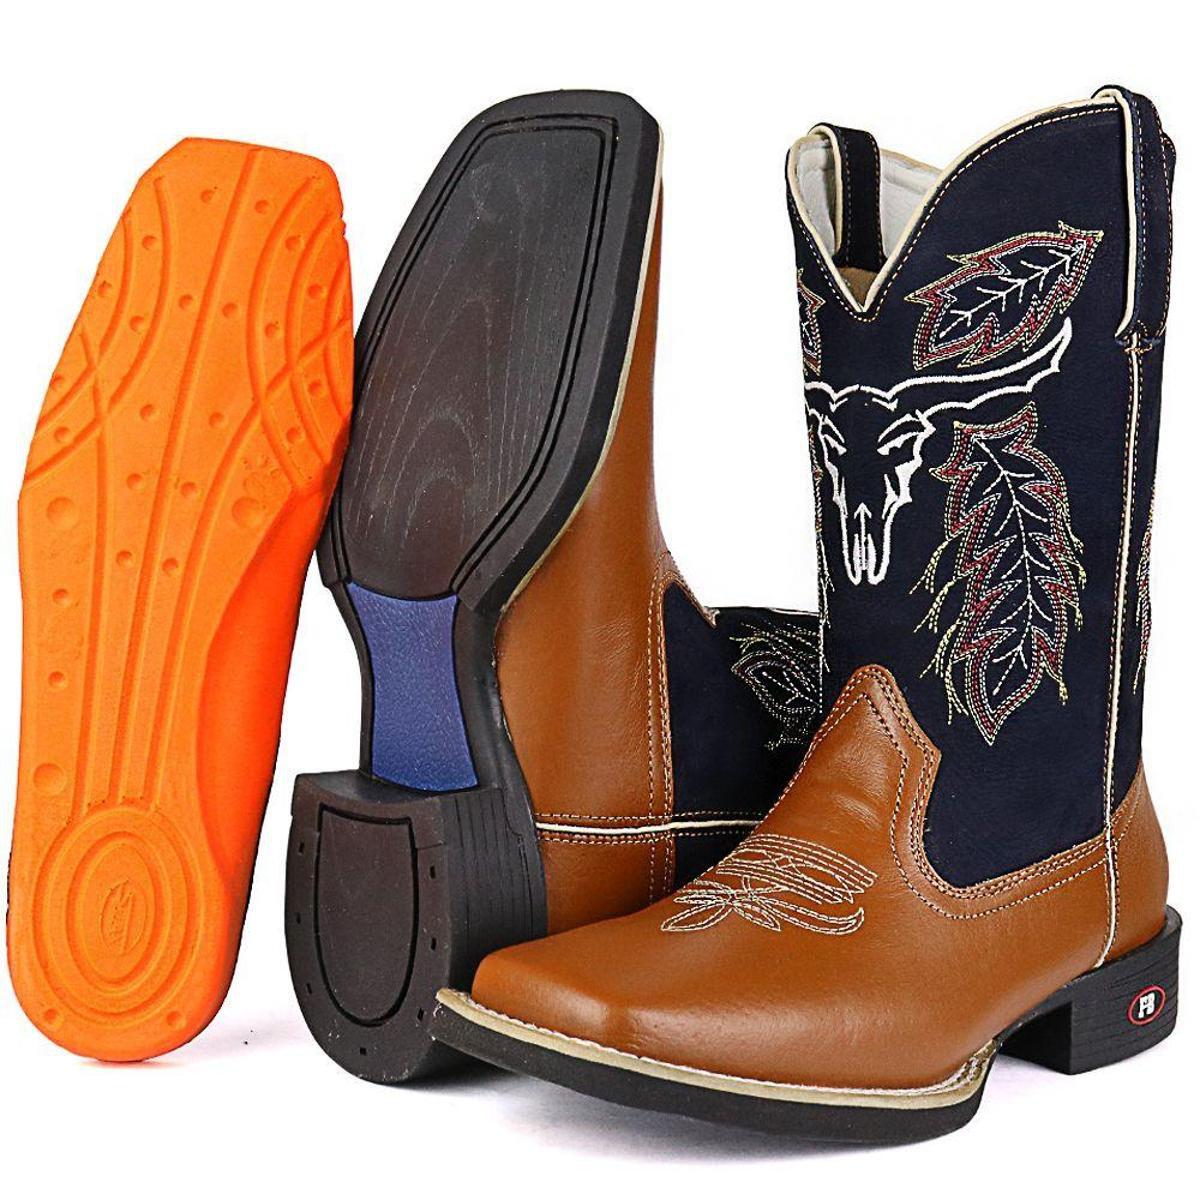 Bota Couro Texana Country SapatoFran Masculina - Marrom - Compre ... d82b1c800b6